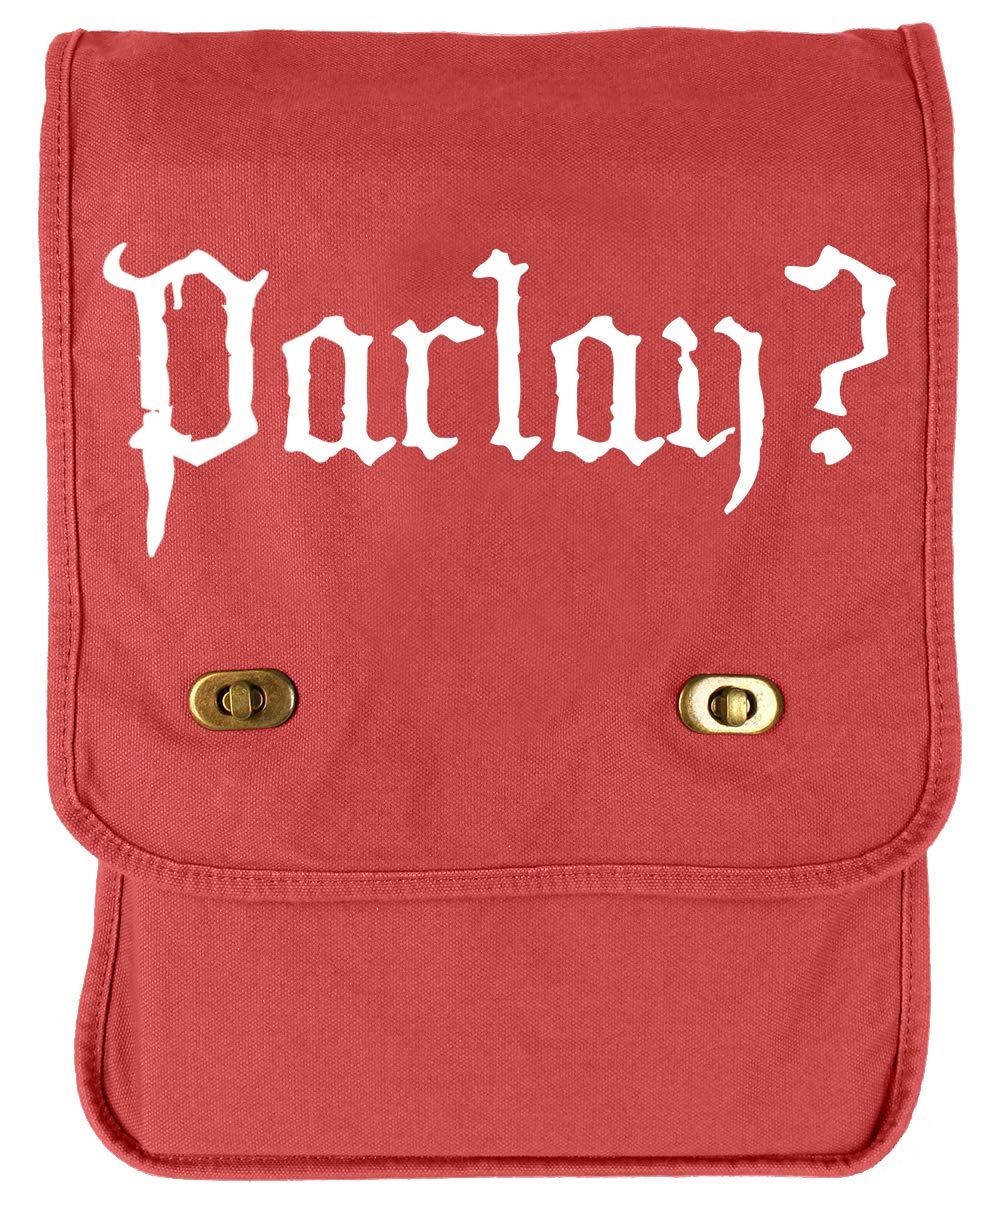 Tenacitee Parlay Red Brushed Canvas Messenger Bag